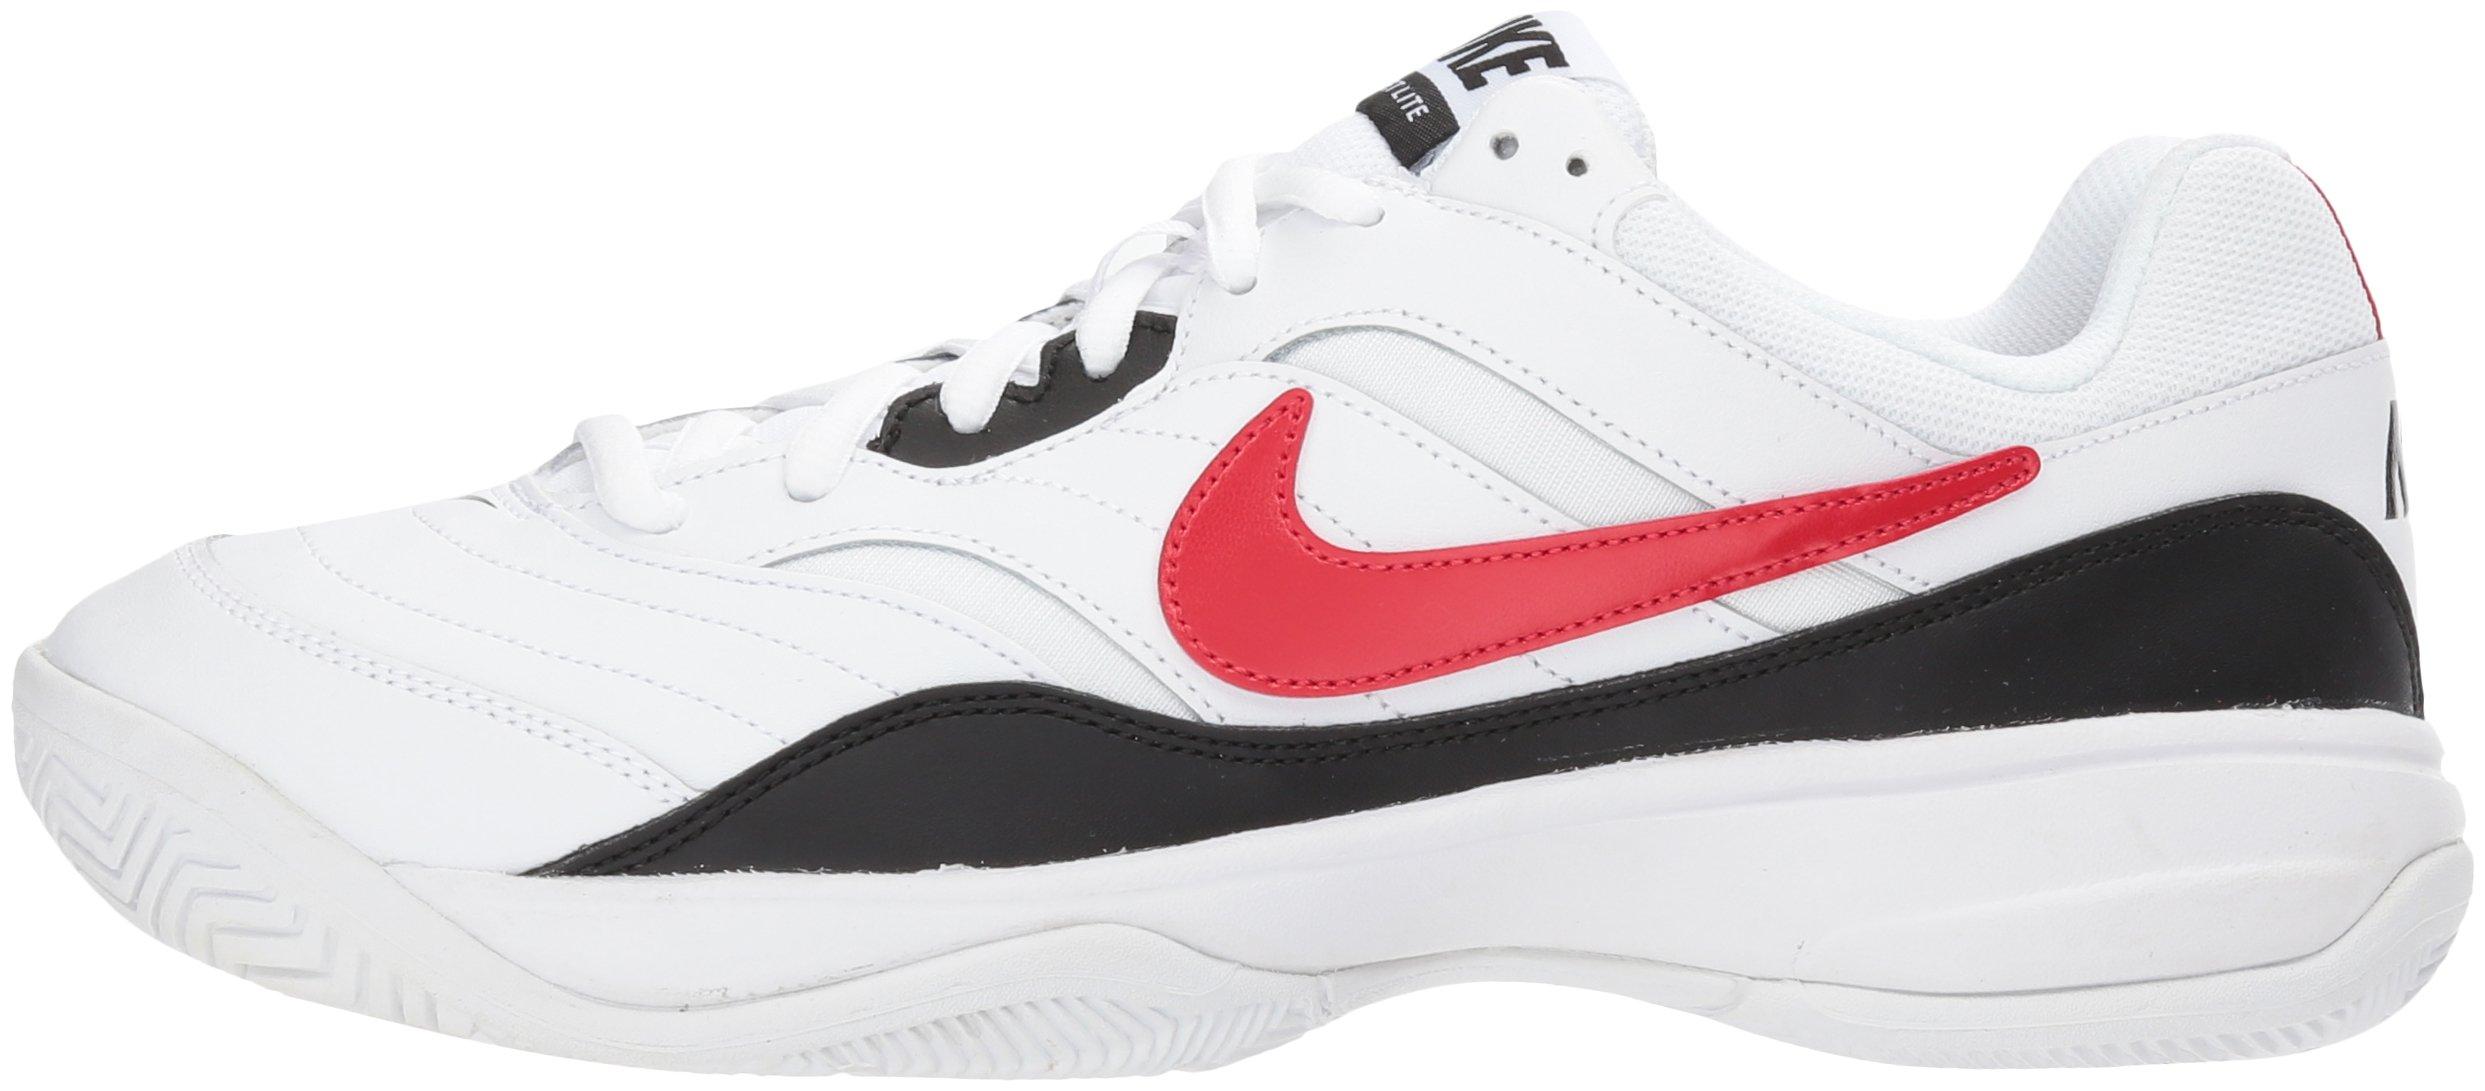 Nike Men's Court Lite Tennis Shoe, White/University red/Black, 7.5 D US by Nike (Image #5)